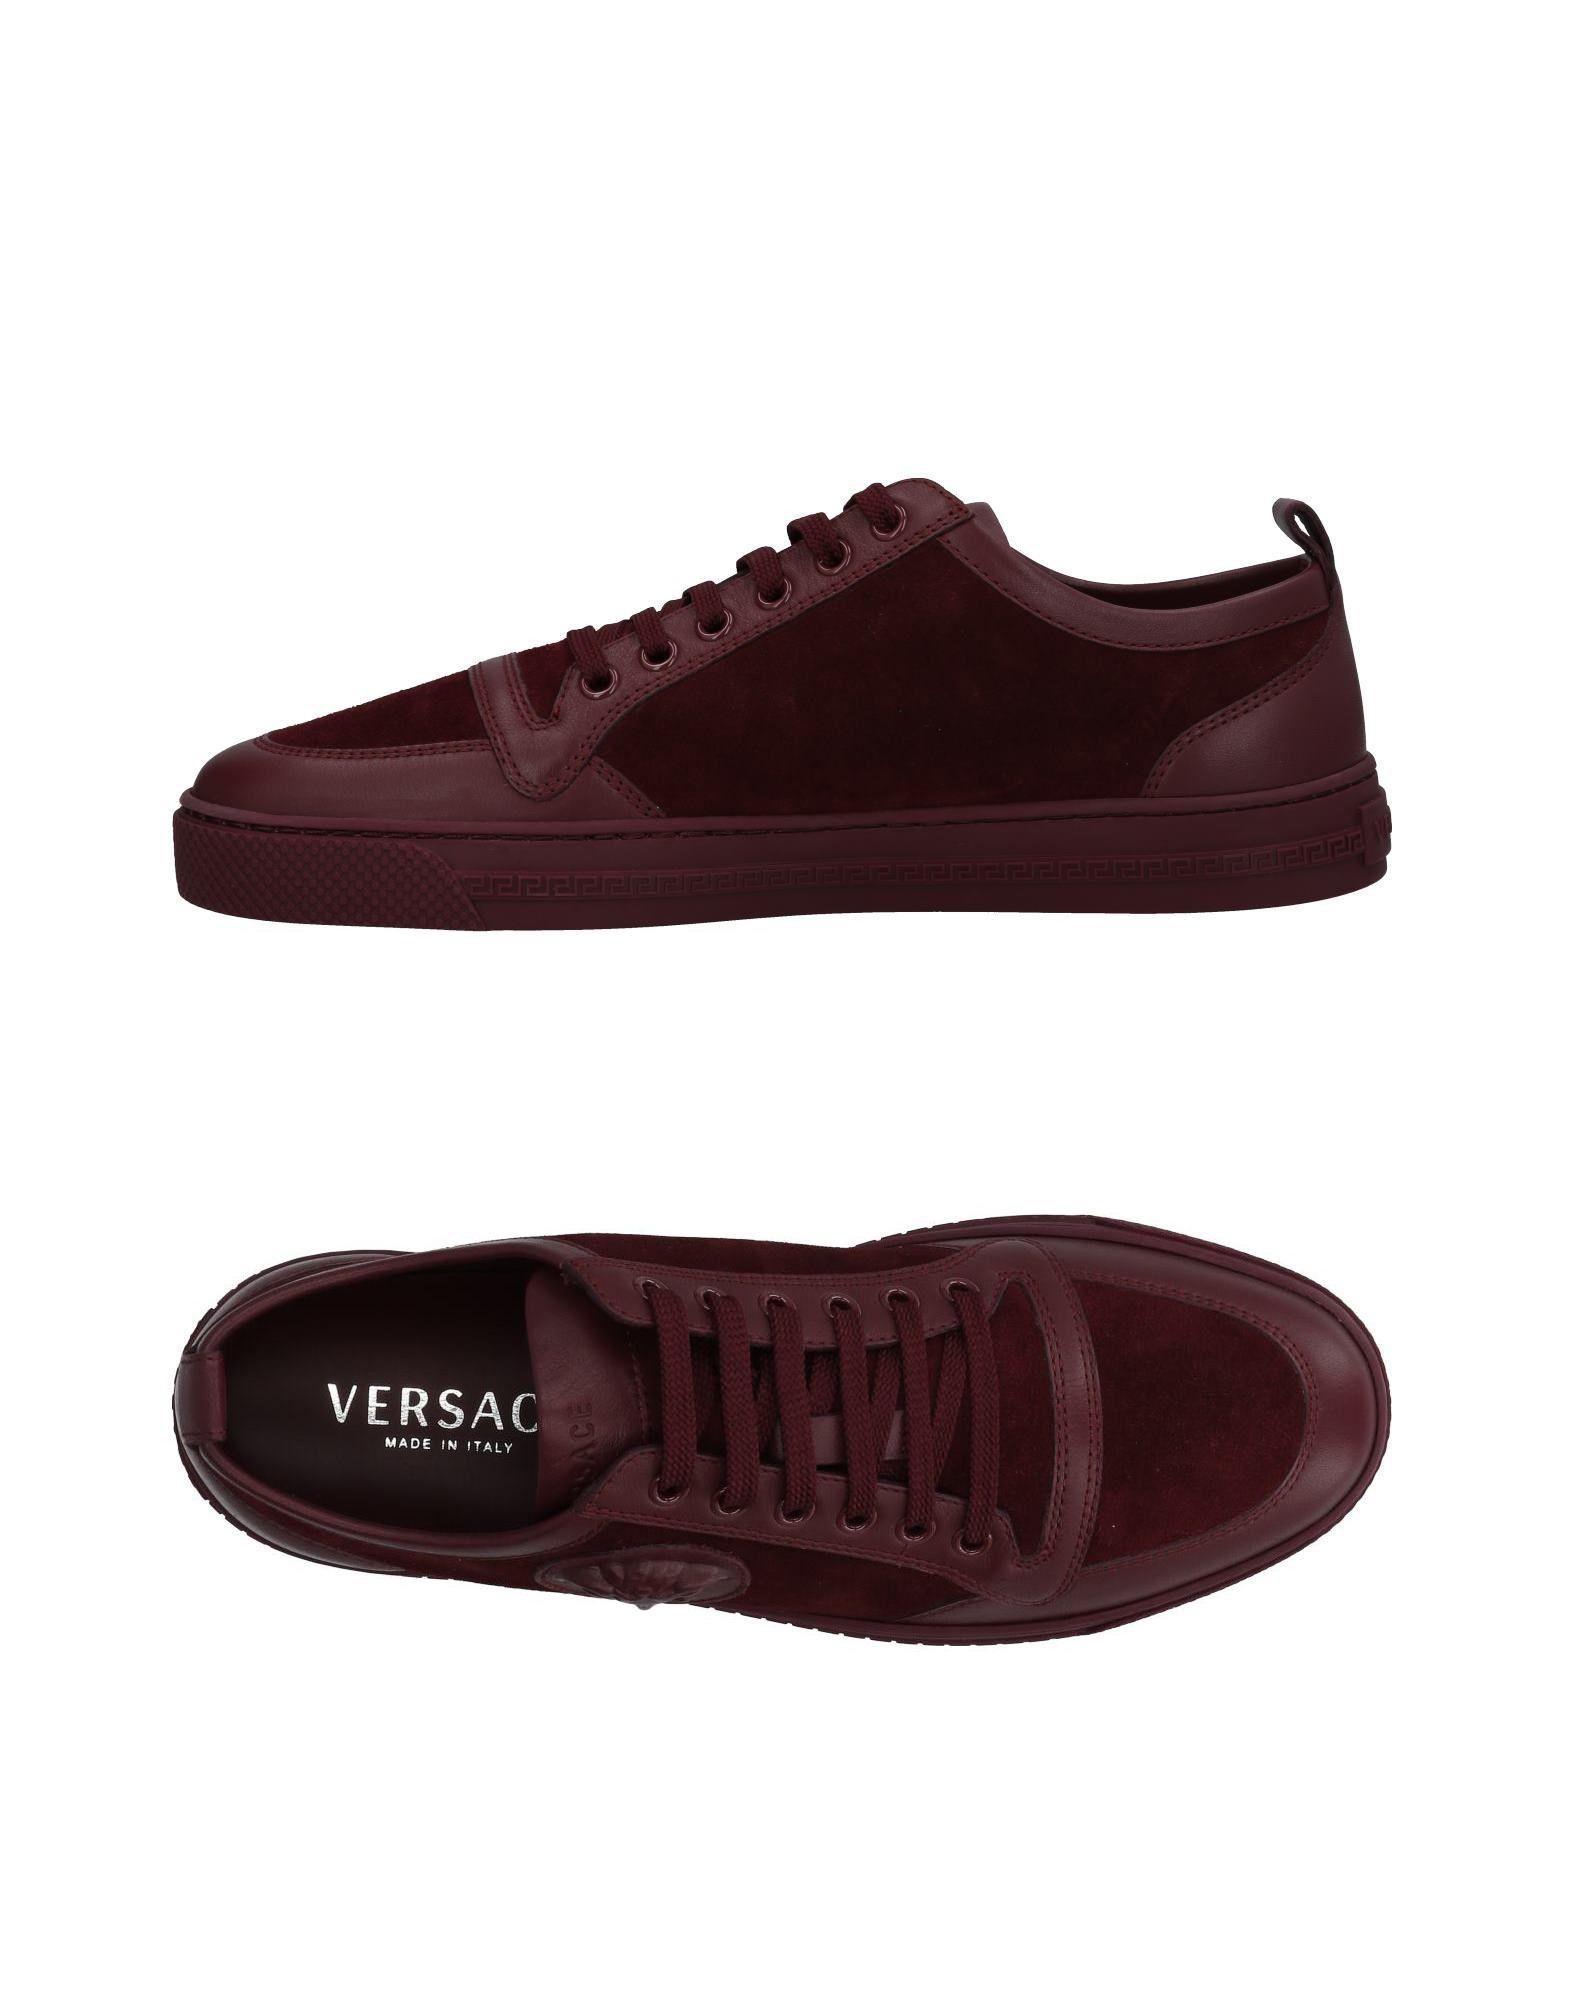 Versace Sneakers Herren  11461272AN Gute Qualität beliebte Schuhe